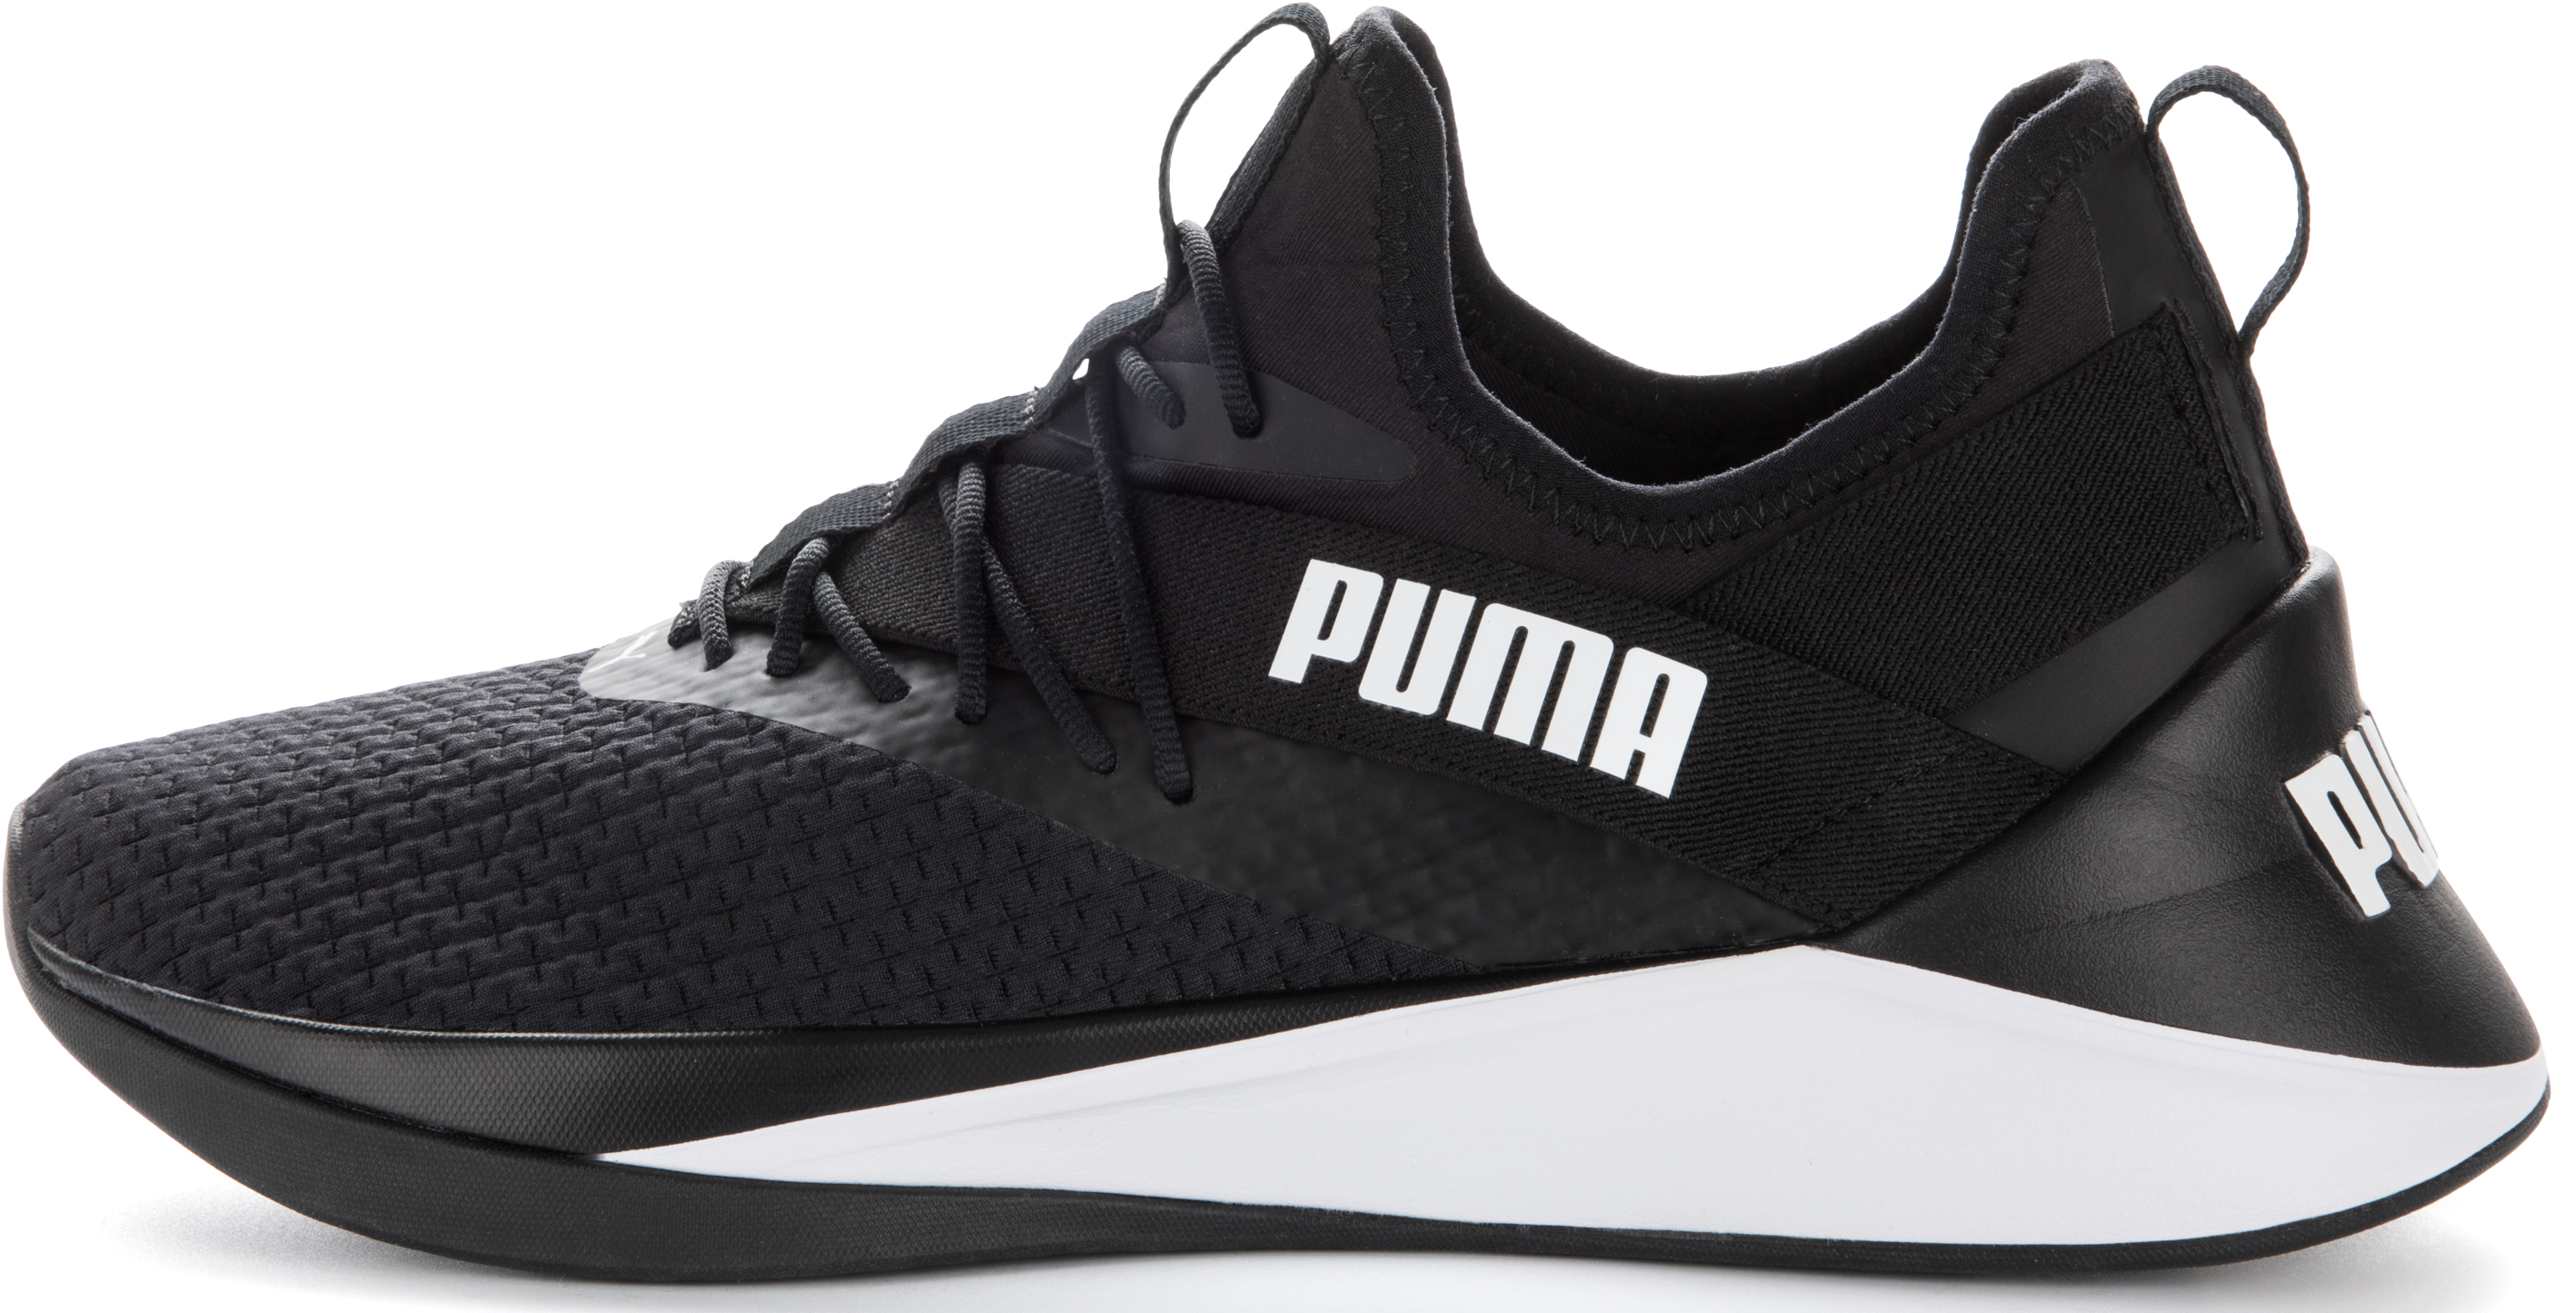 Puma Кроссовки мужские Puma Jaab Xt, размер 43 puma puma red woman